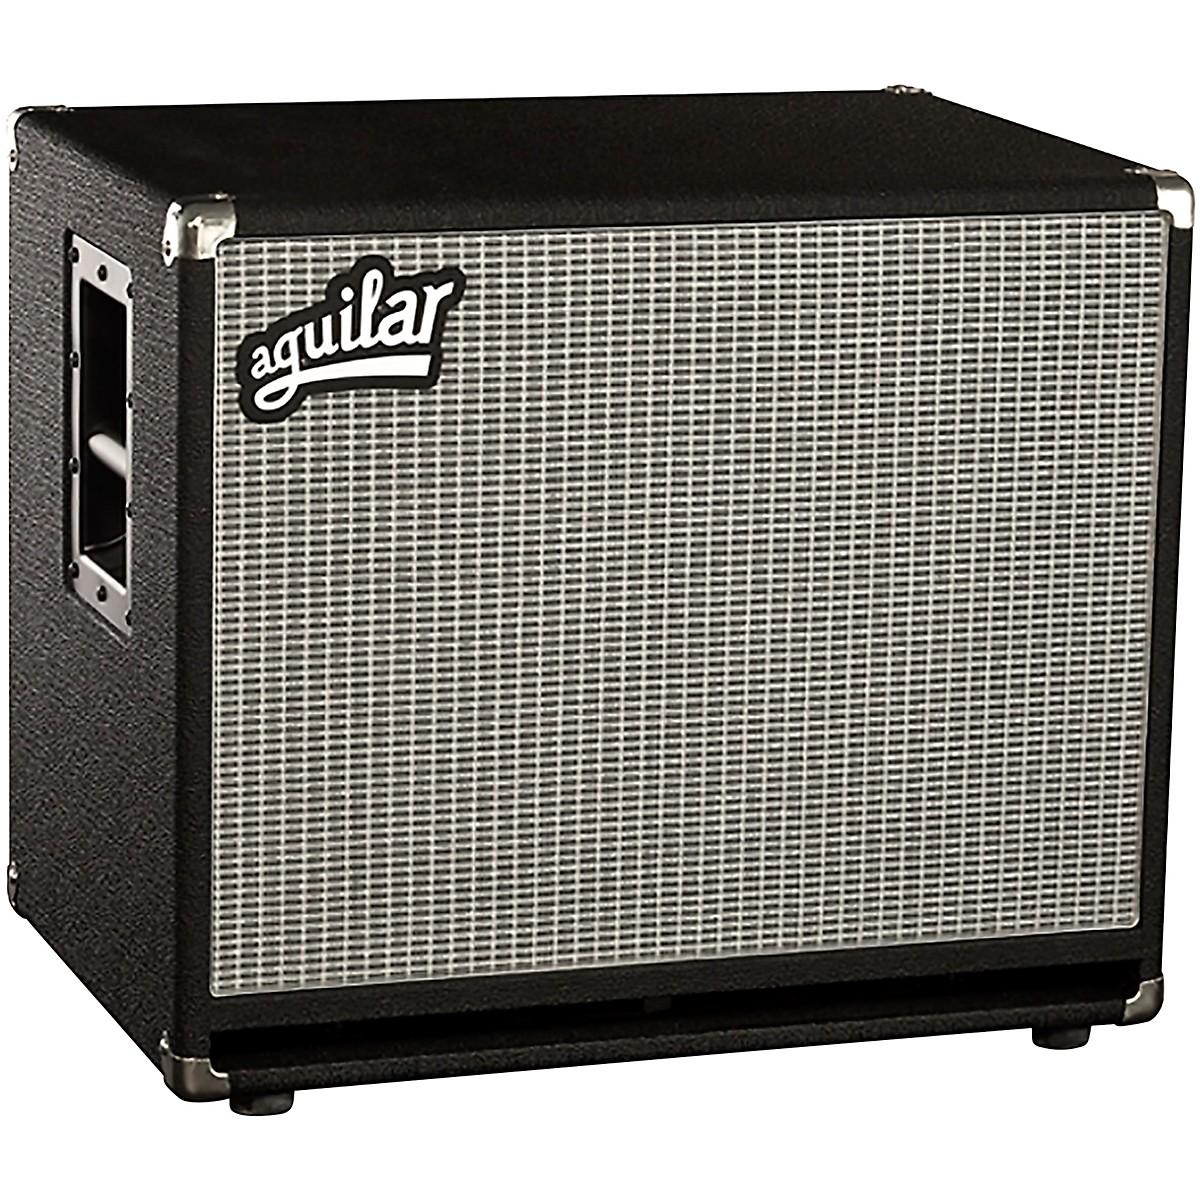 Aguilar DB 115 400W 1x15 8 Ohm Bass Speaker Cabinet